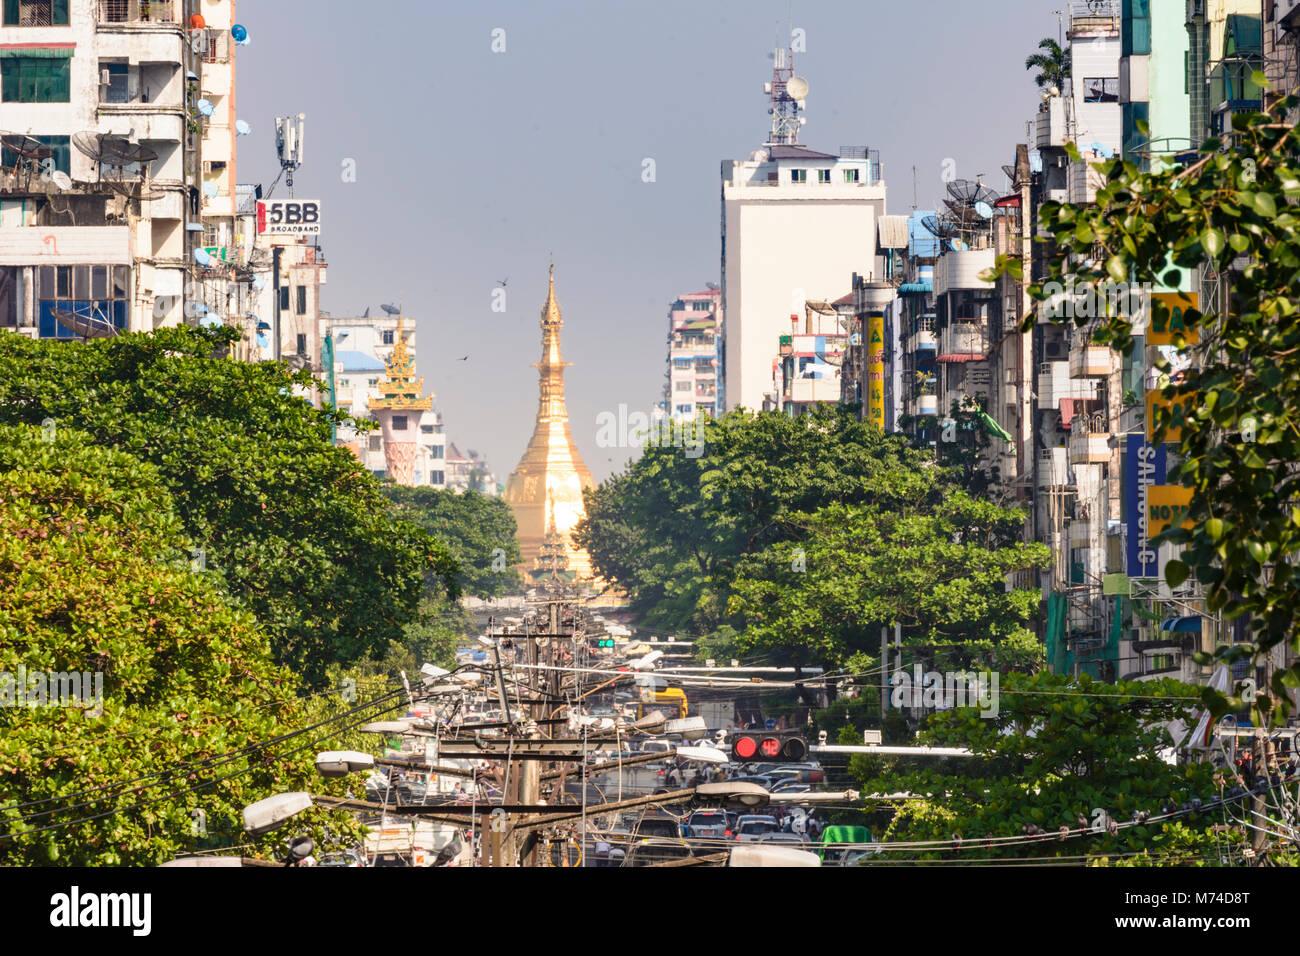 Yangon (Rangoon): Maha Bandoola Road, view to golden Sule Pagoda, road traffic, Colonial Quarter, Yangon Region, - Stock Image